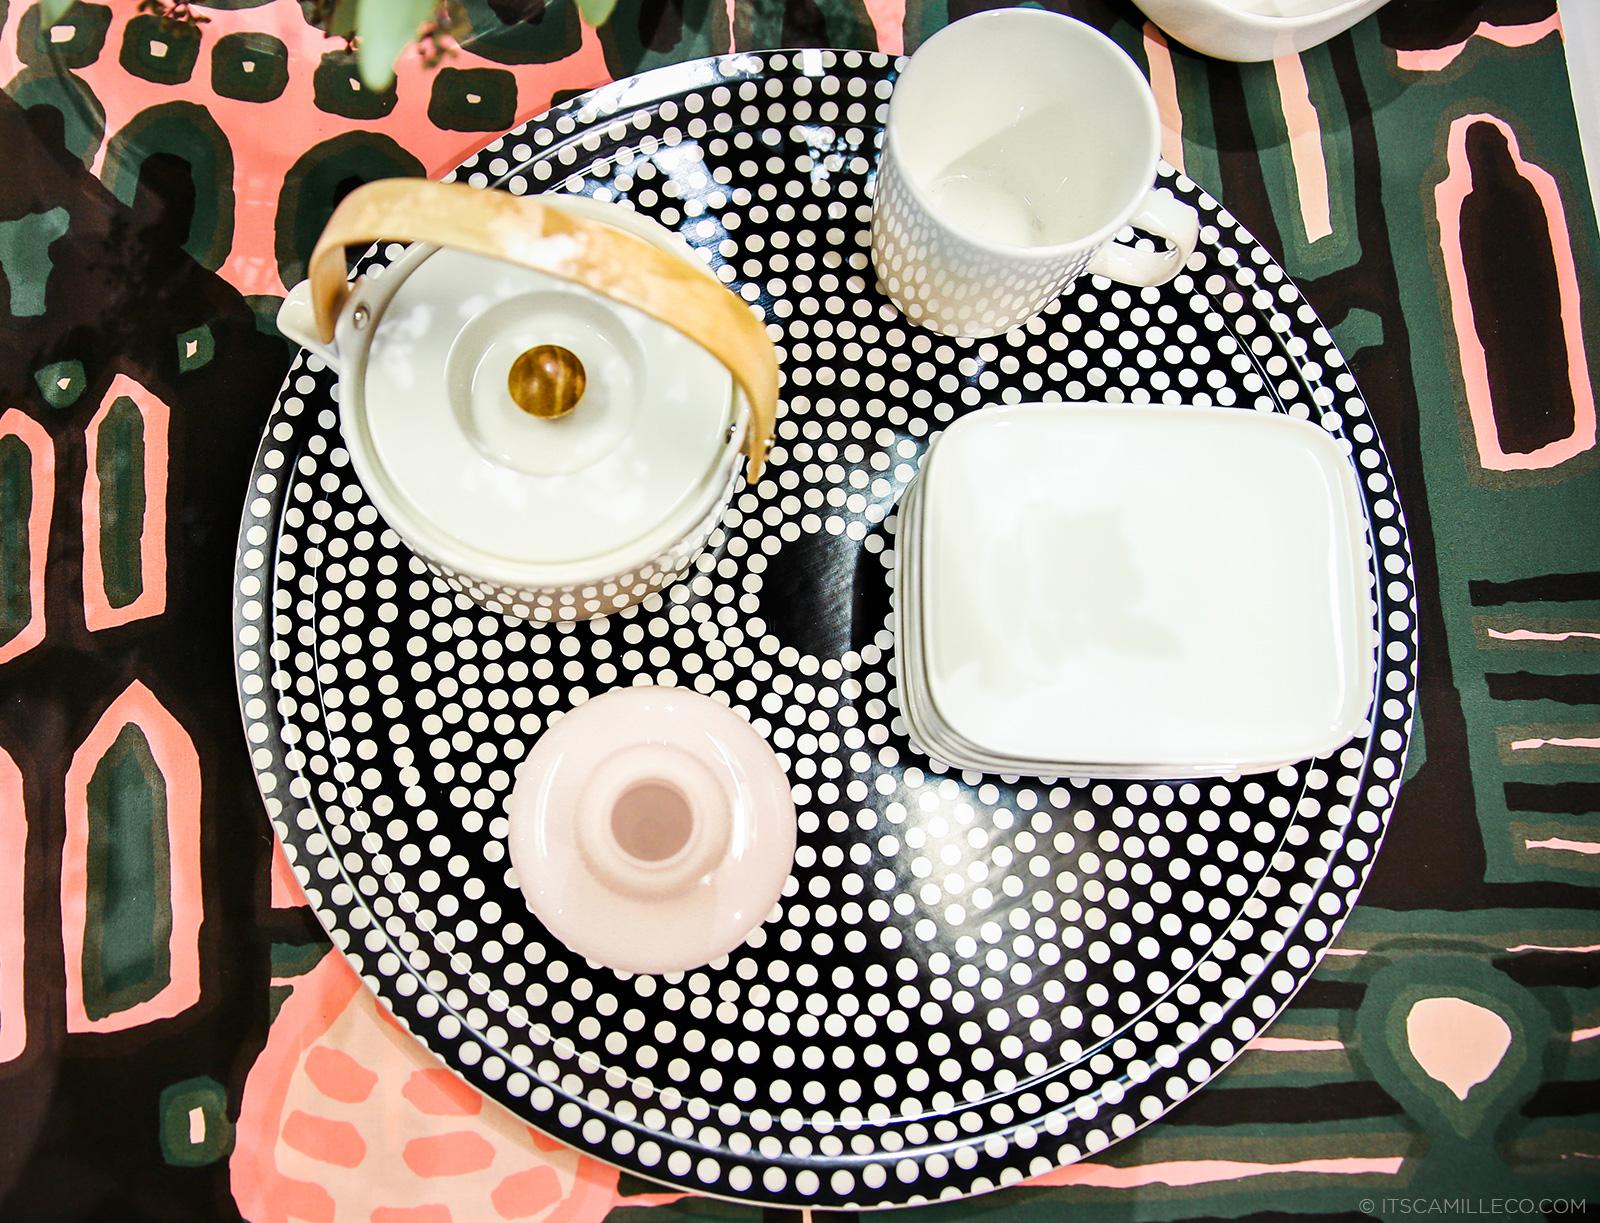 Marimekko - www.itscamilleco.com